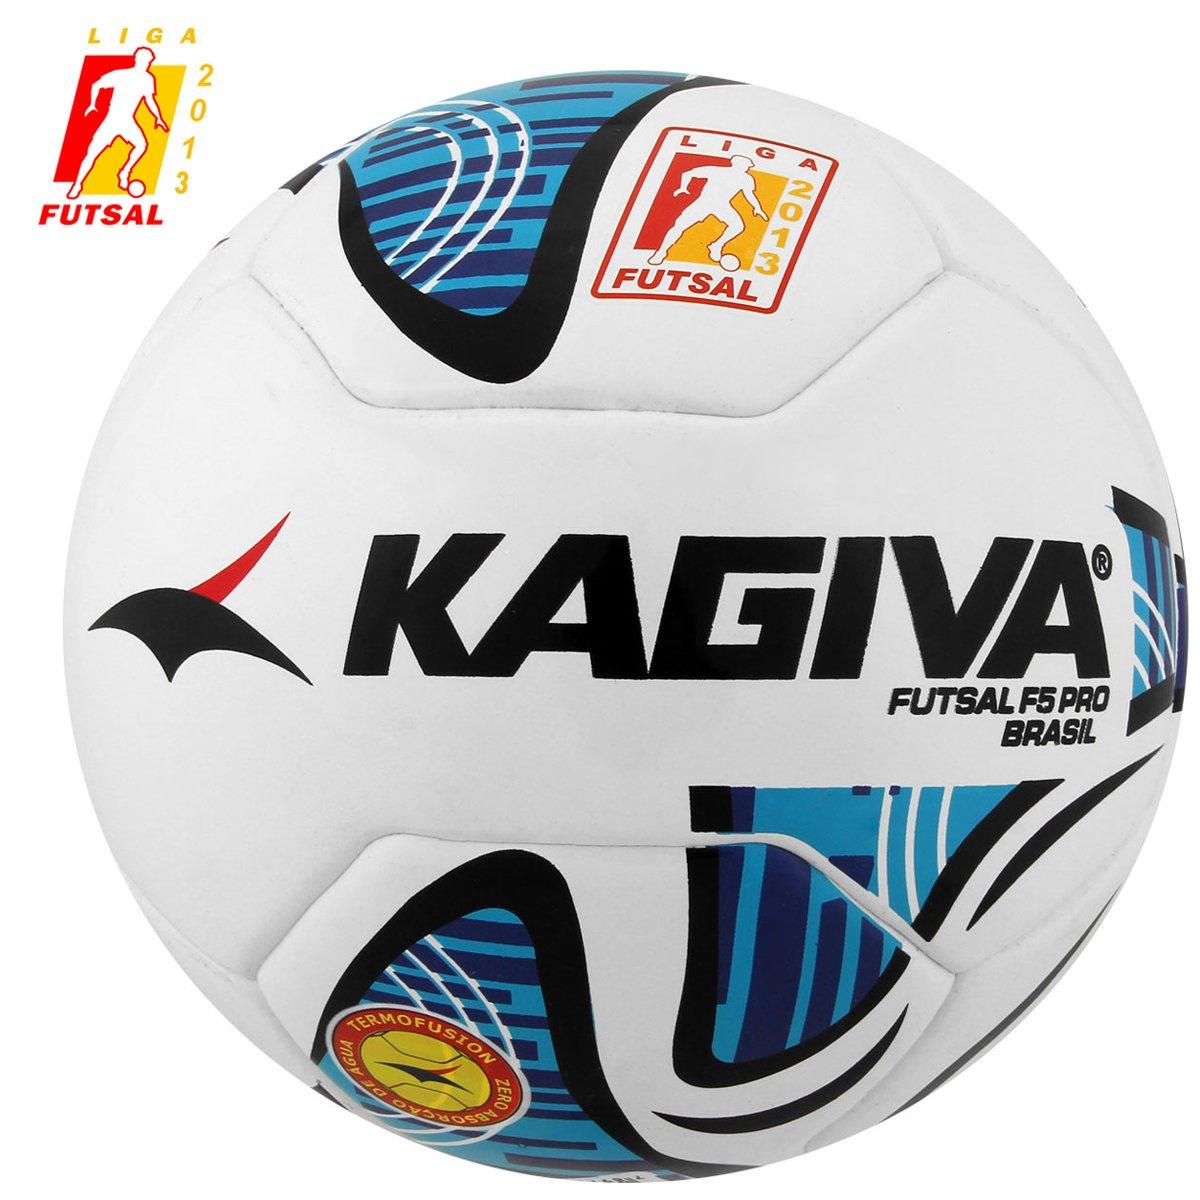 a8256de124f94 Bola Kagiva F5 Pro FPFS Futsal - Compre Agora